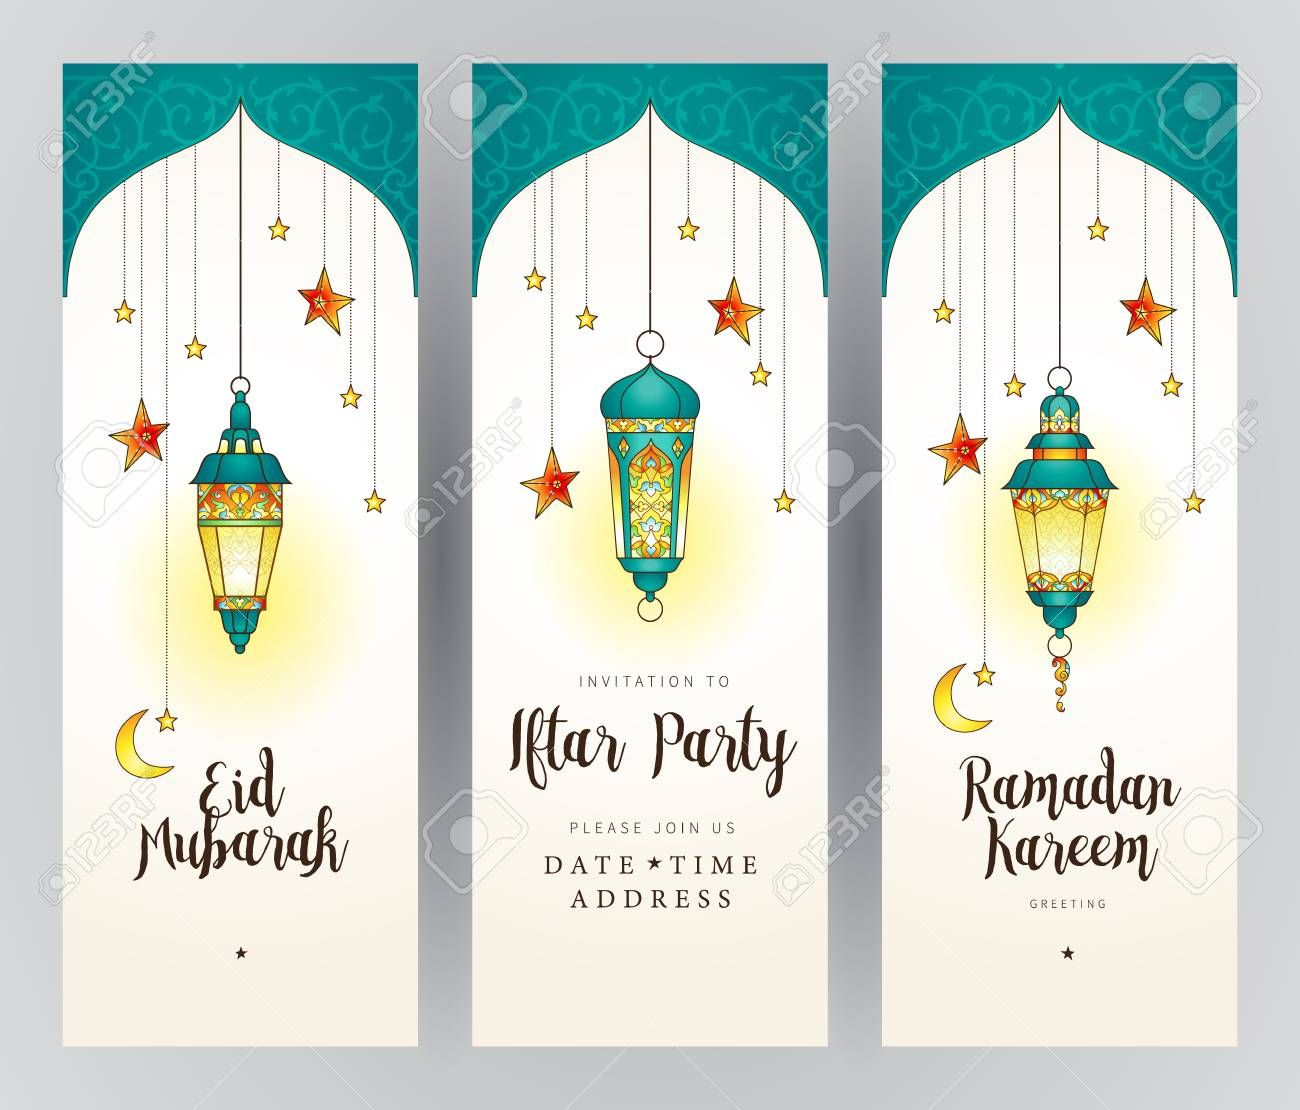 Vector Ramadan Kareem Cards Ornate Invitation To Iftar Party